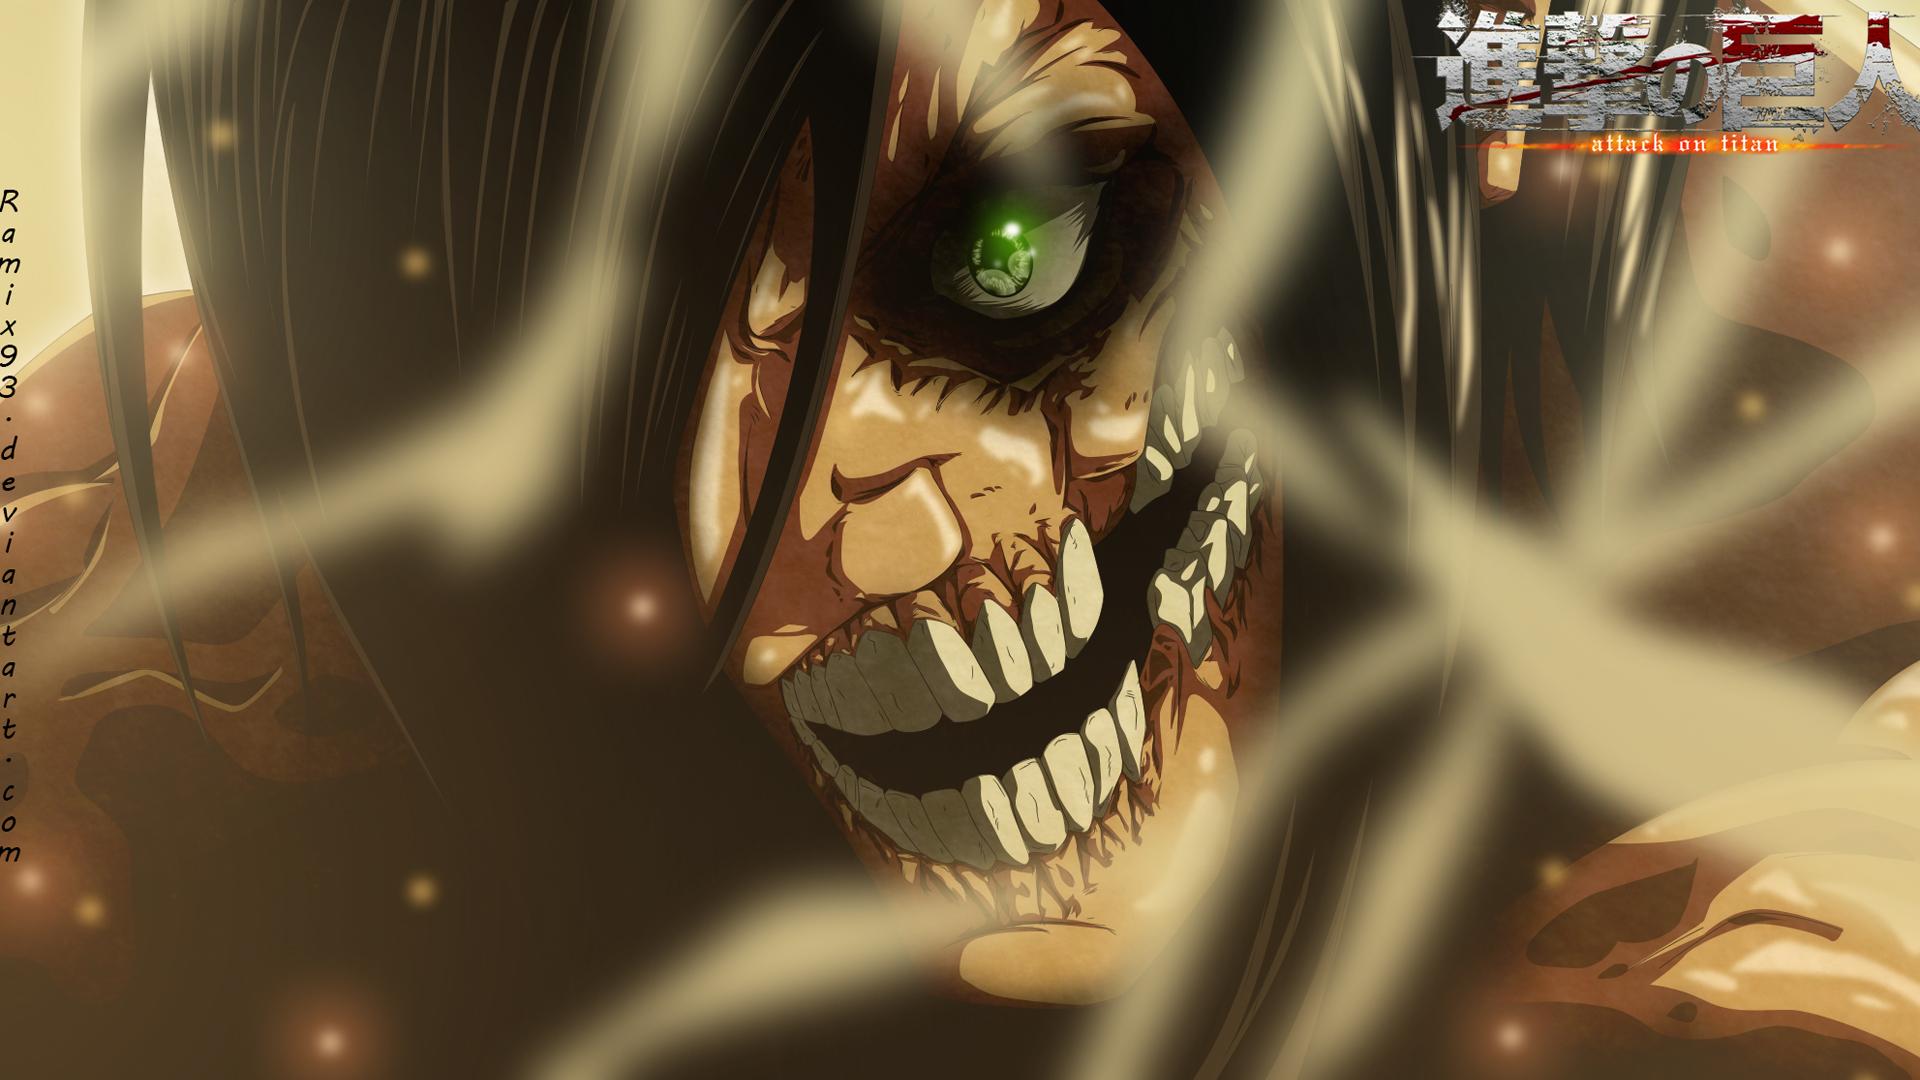 Rogue Titan Eren Jaeger Yeager Attack on Titan Shingeki no Kyojin 1920x1080